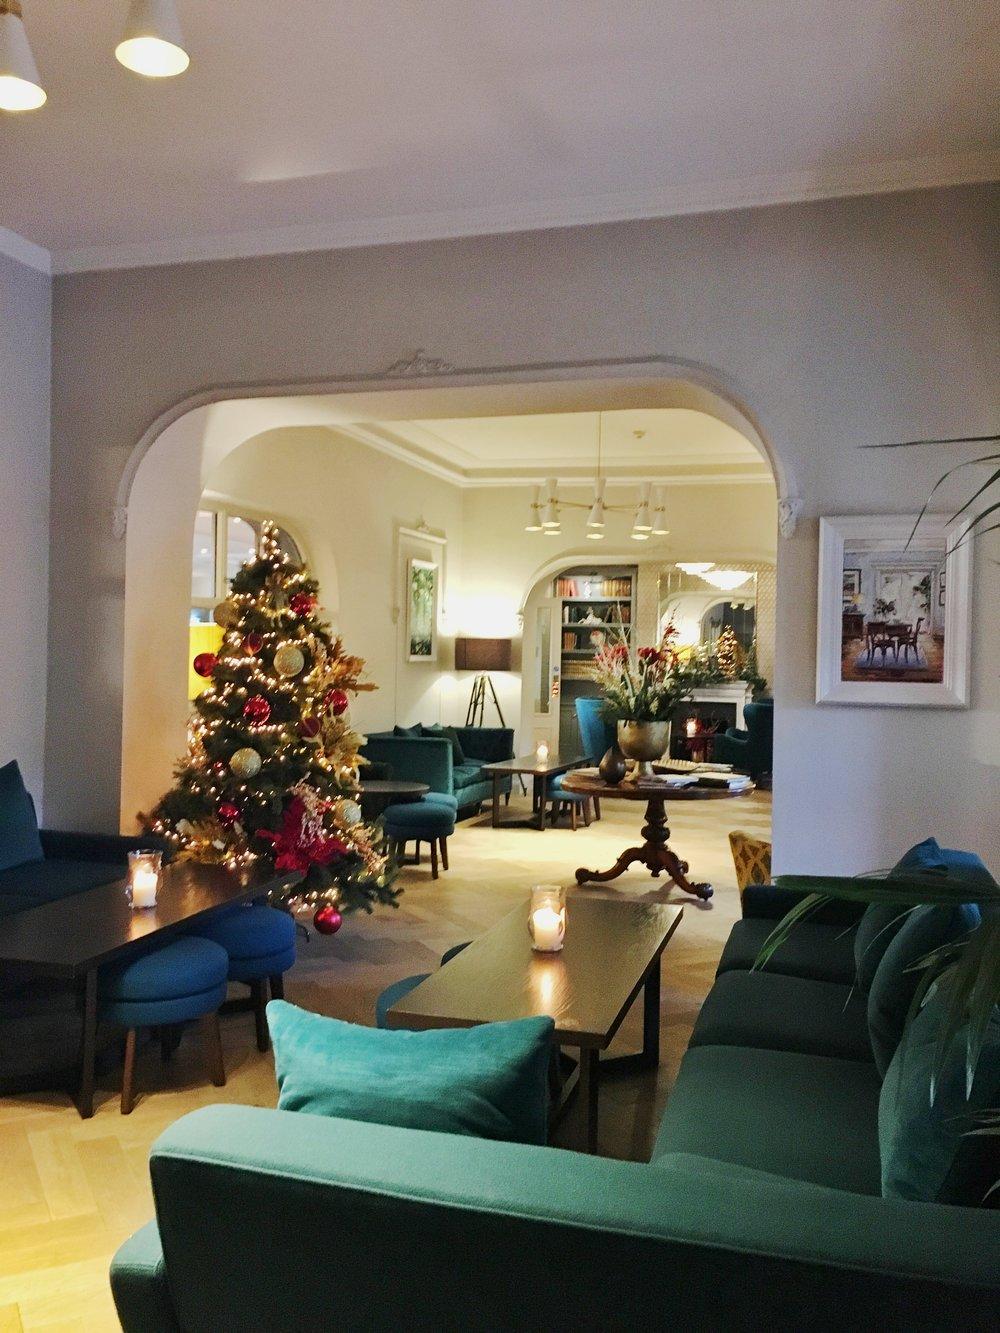 The Montenotte Hotel, Cork. www.pinaforesandpeonies.com